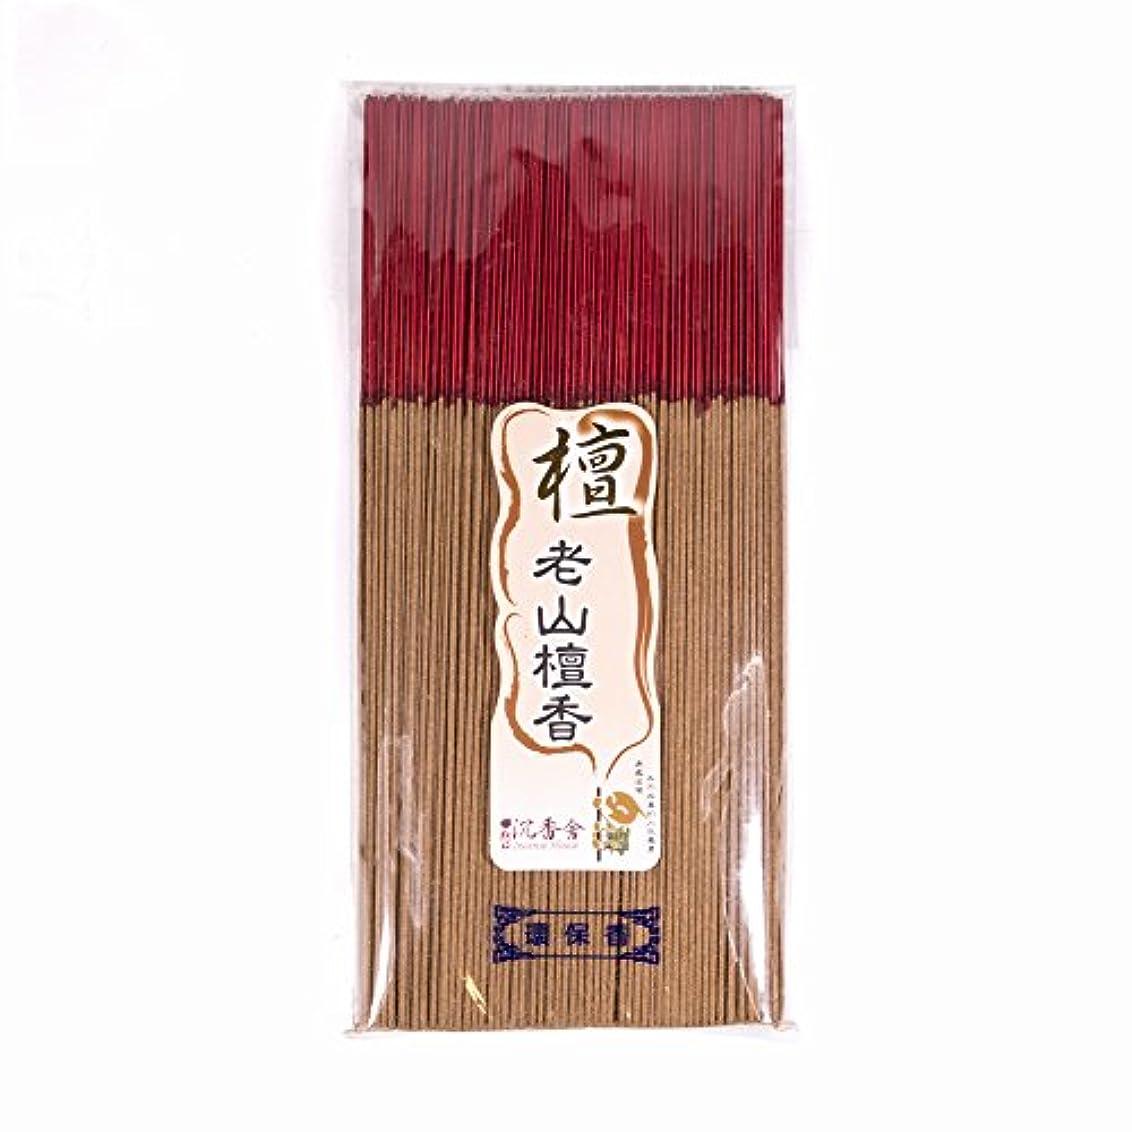 偽物金銭的なスペア台湾沉香舍 老山檀香 台湾のお香家 - 檀香 30cm (木支香) 300g 約400本